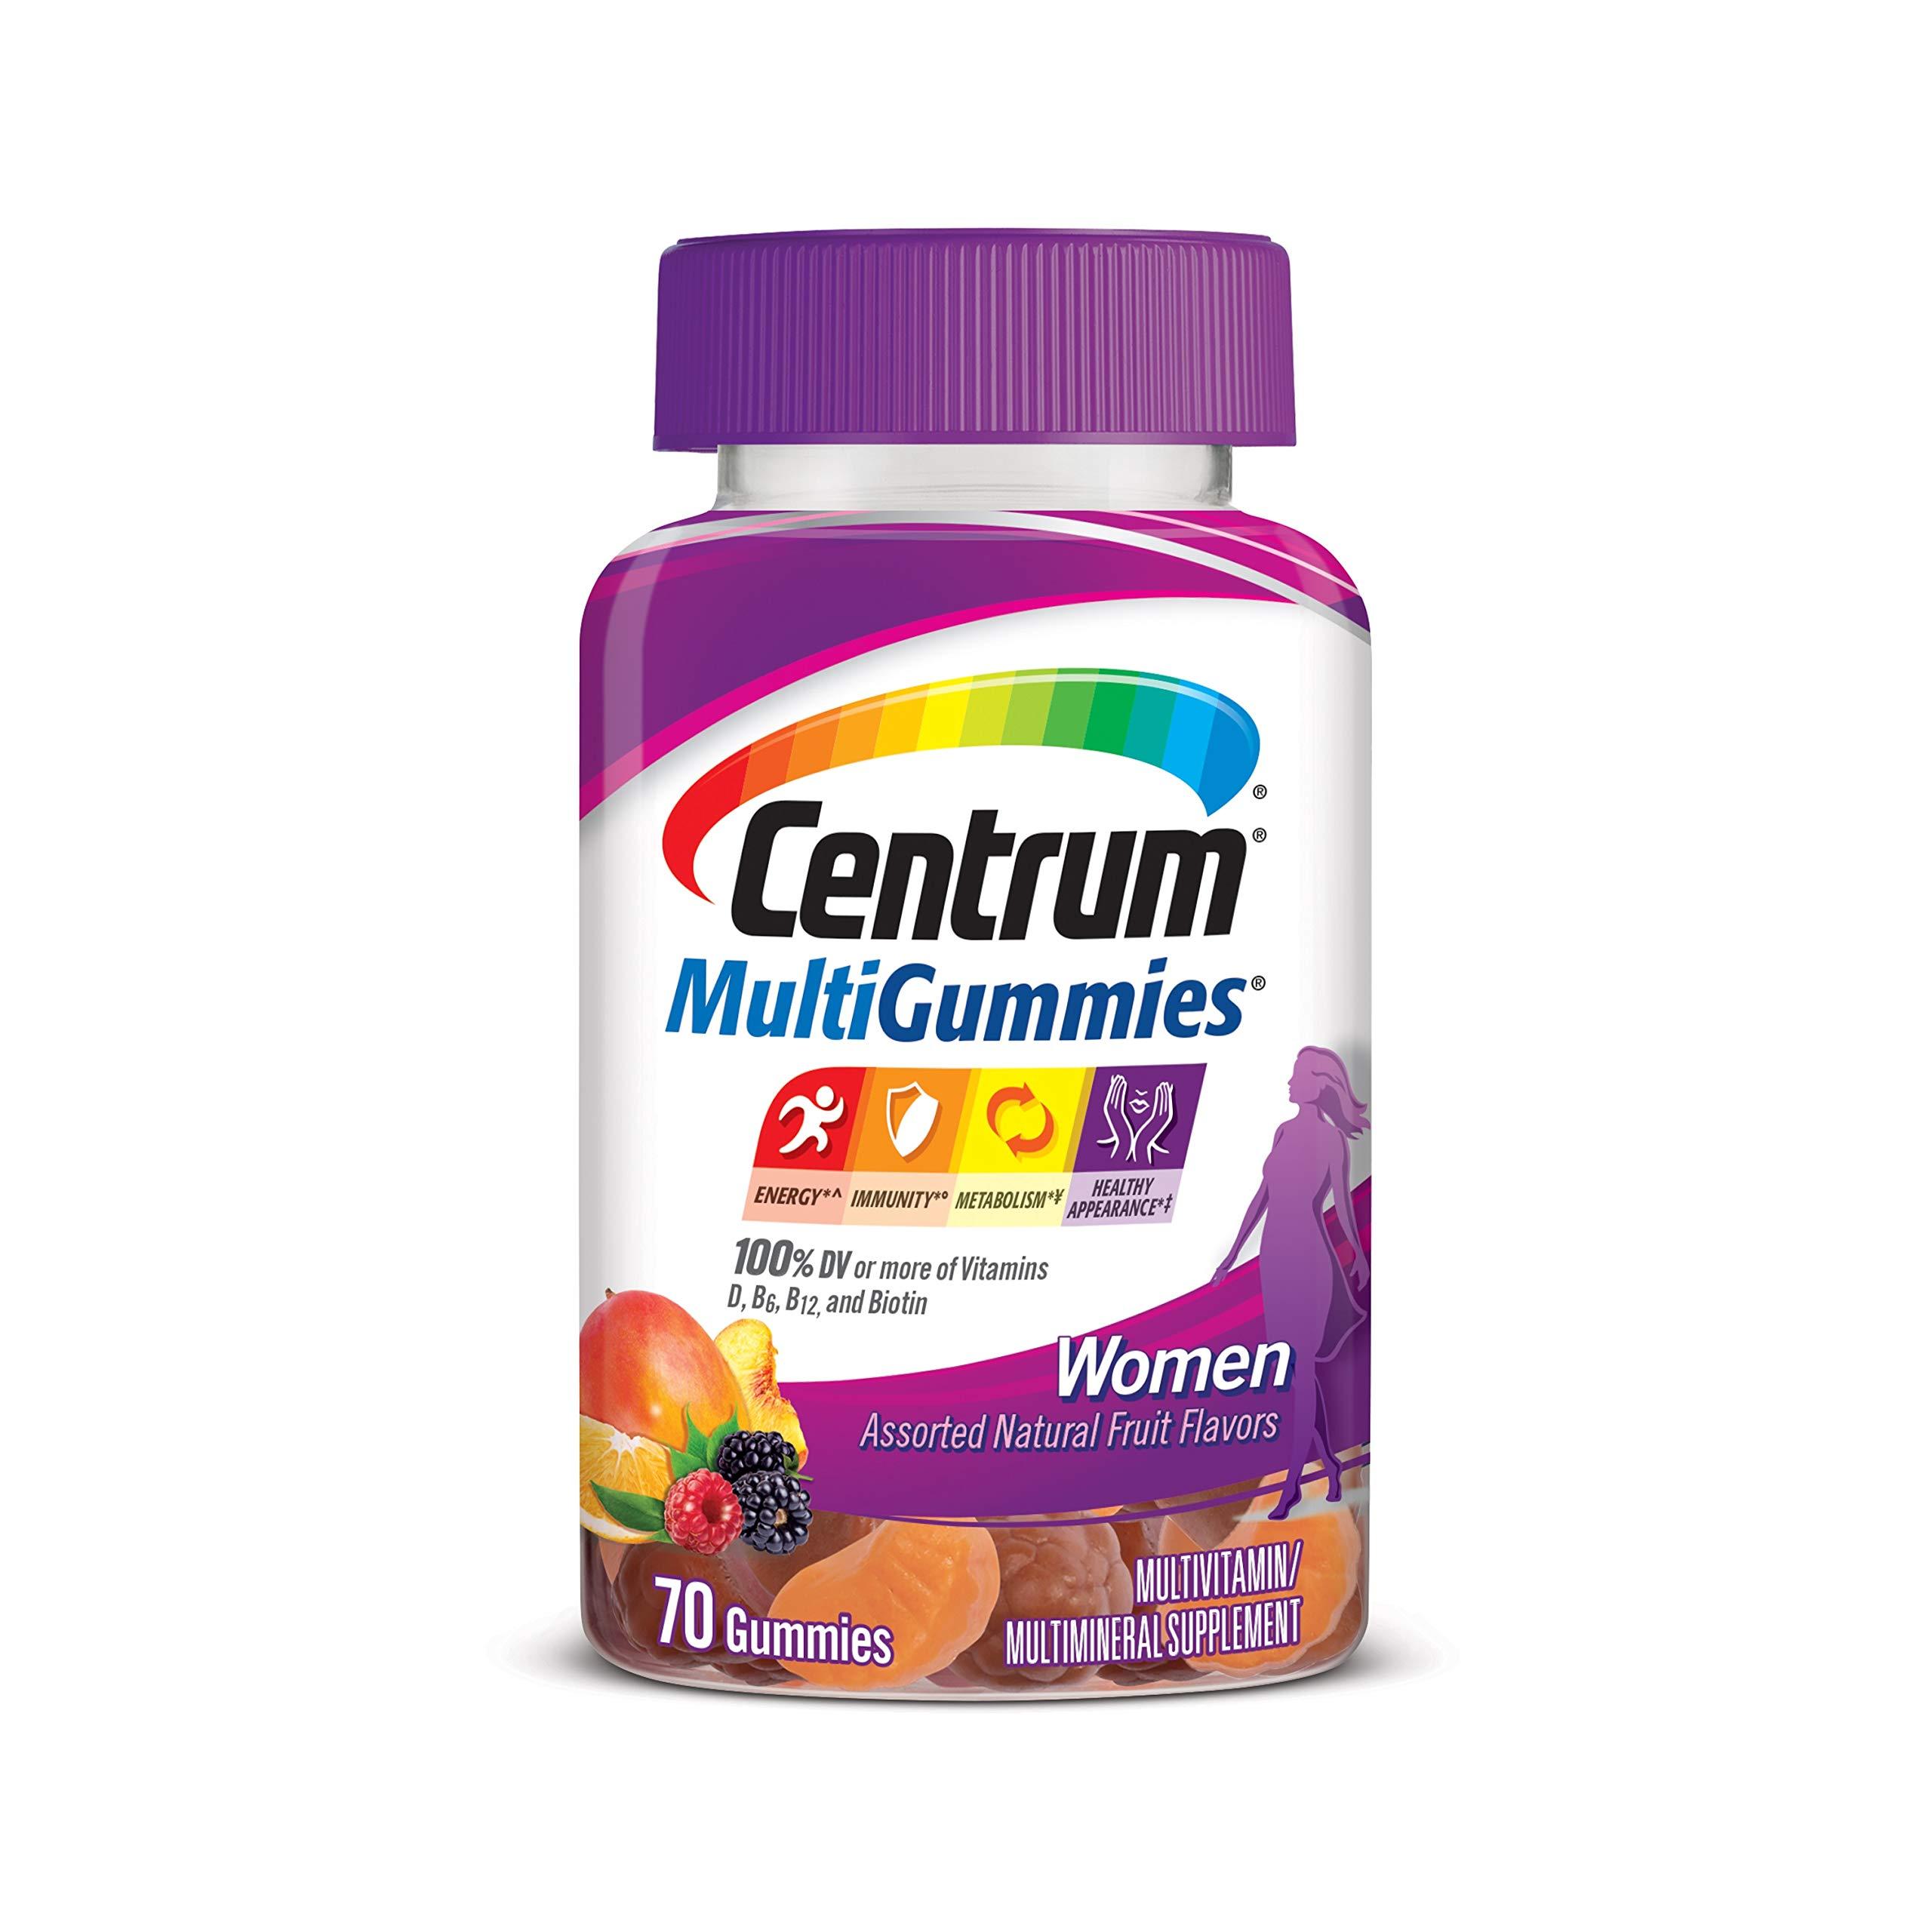 Centrum MultiGummies Gummy Multivitamin for Women, Multivitamin/Multimineral Supplement with Vitamin D3, B Vitamins and Antioxidants, Assorted Fruit, Flavor - Orange, 70 Count (Pack of 1)